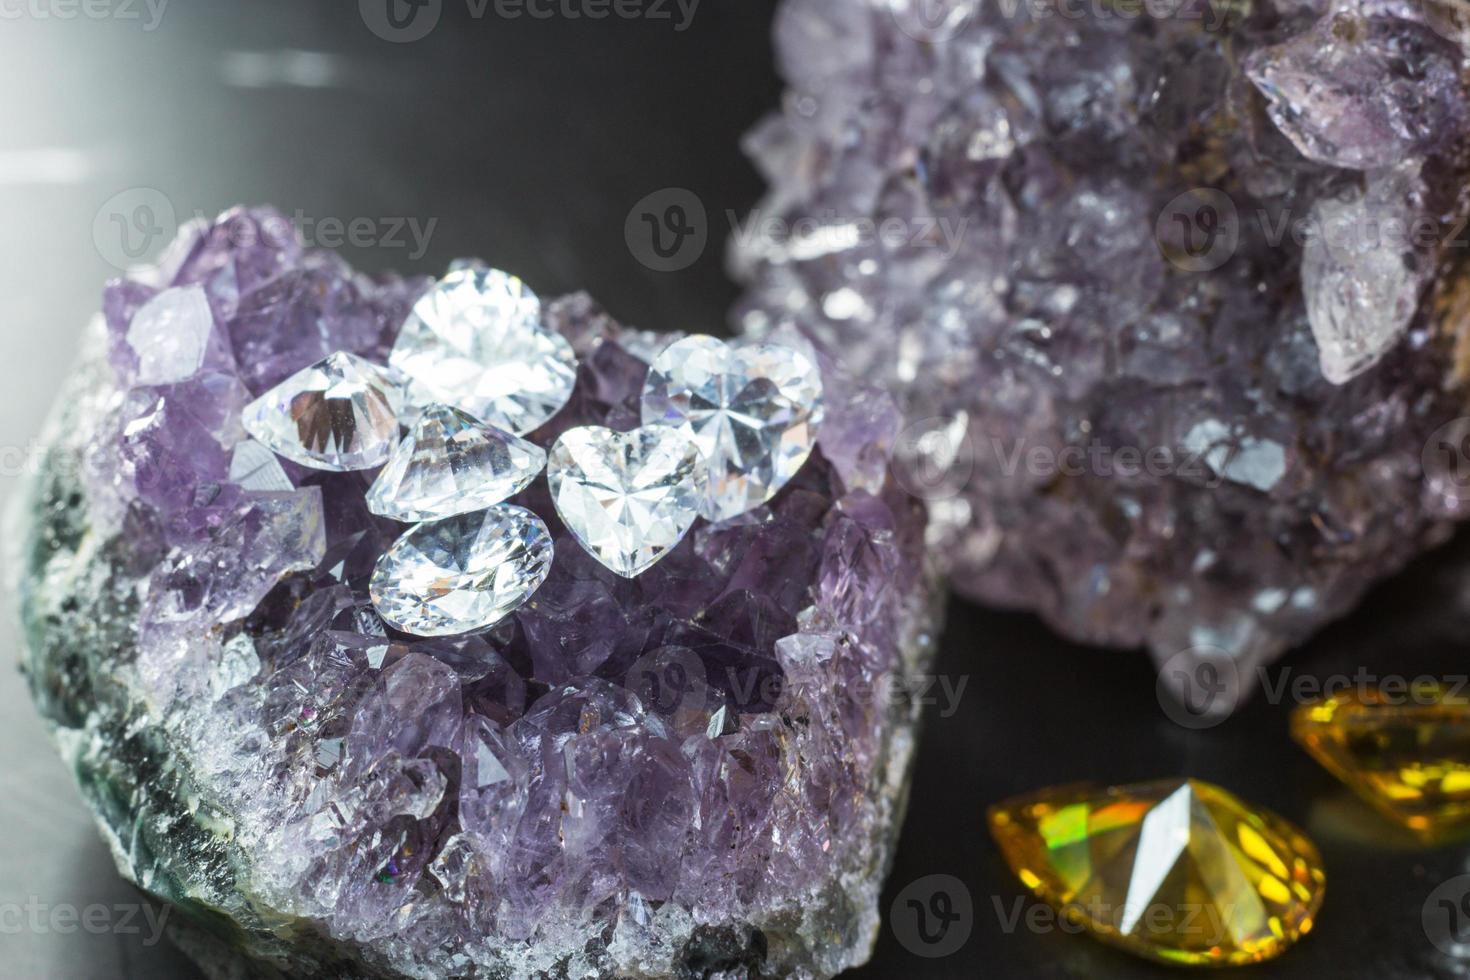 piedra preciosa de zafiro púrpura natural, joyas de piedras preciosas de amatista púrpura foto